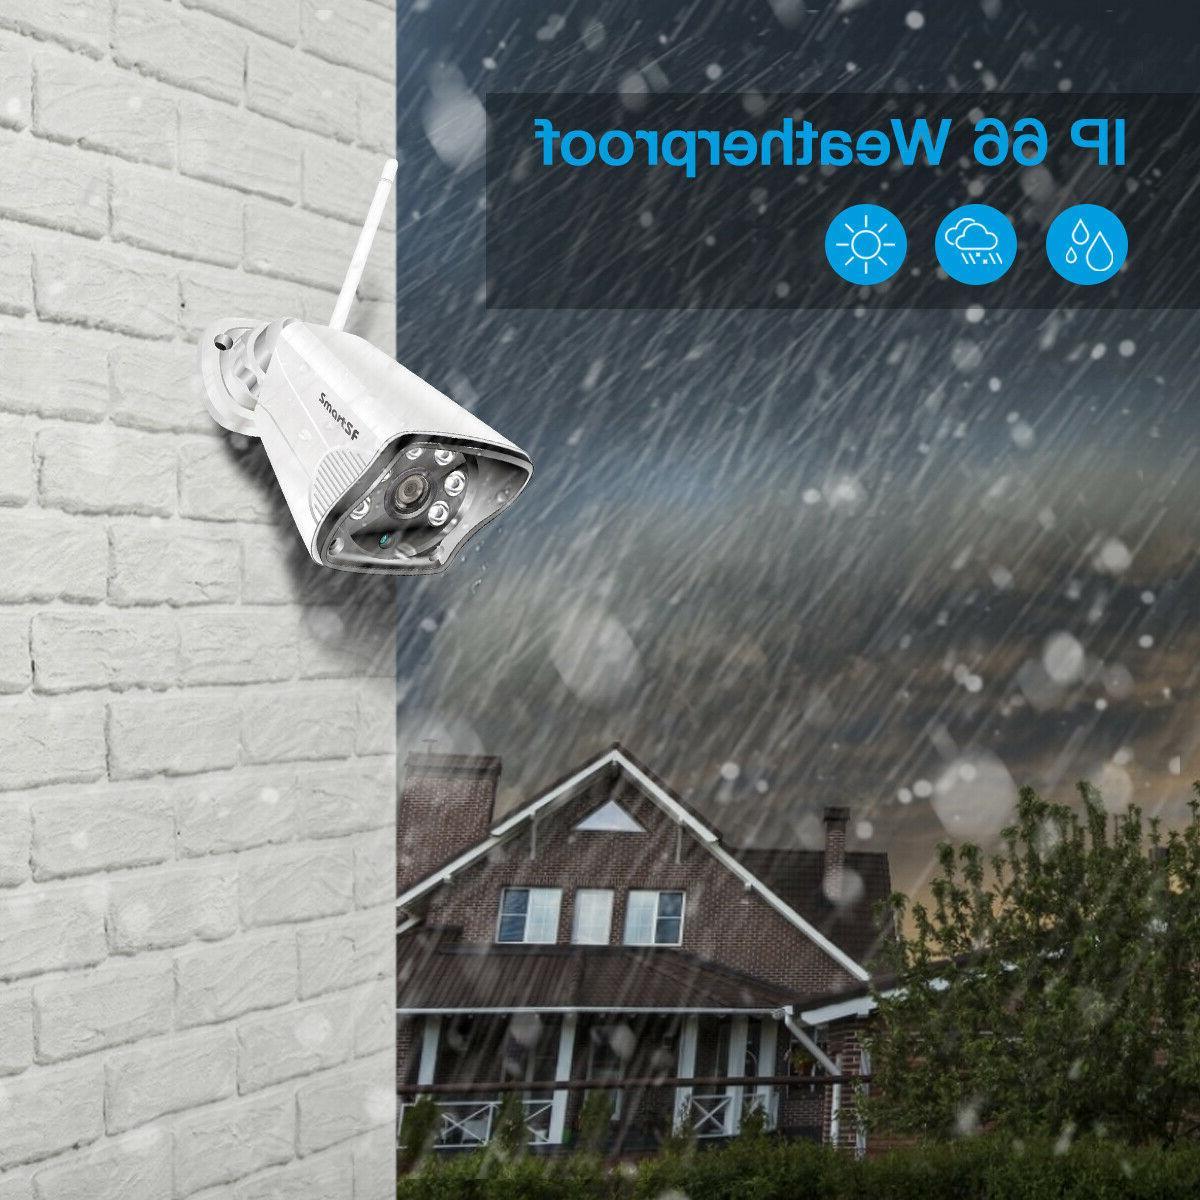 SmartSF 8CH Surveillance System 720P Camera Kit